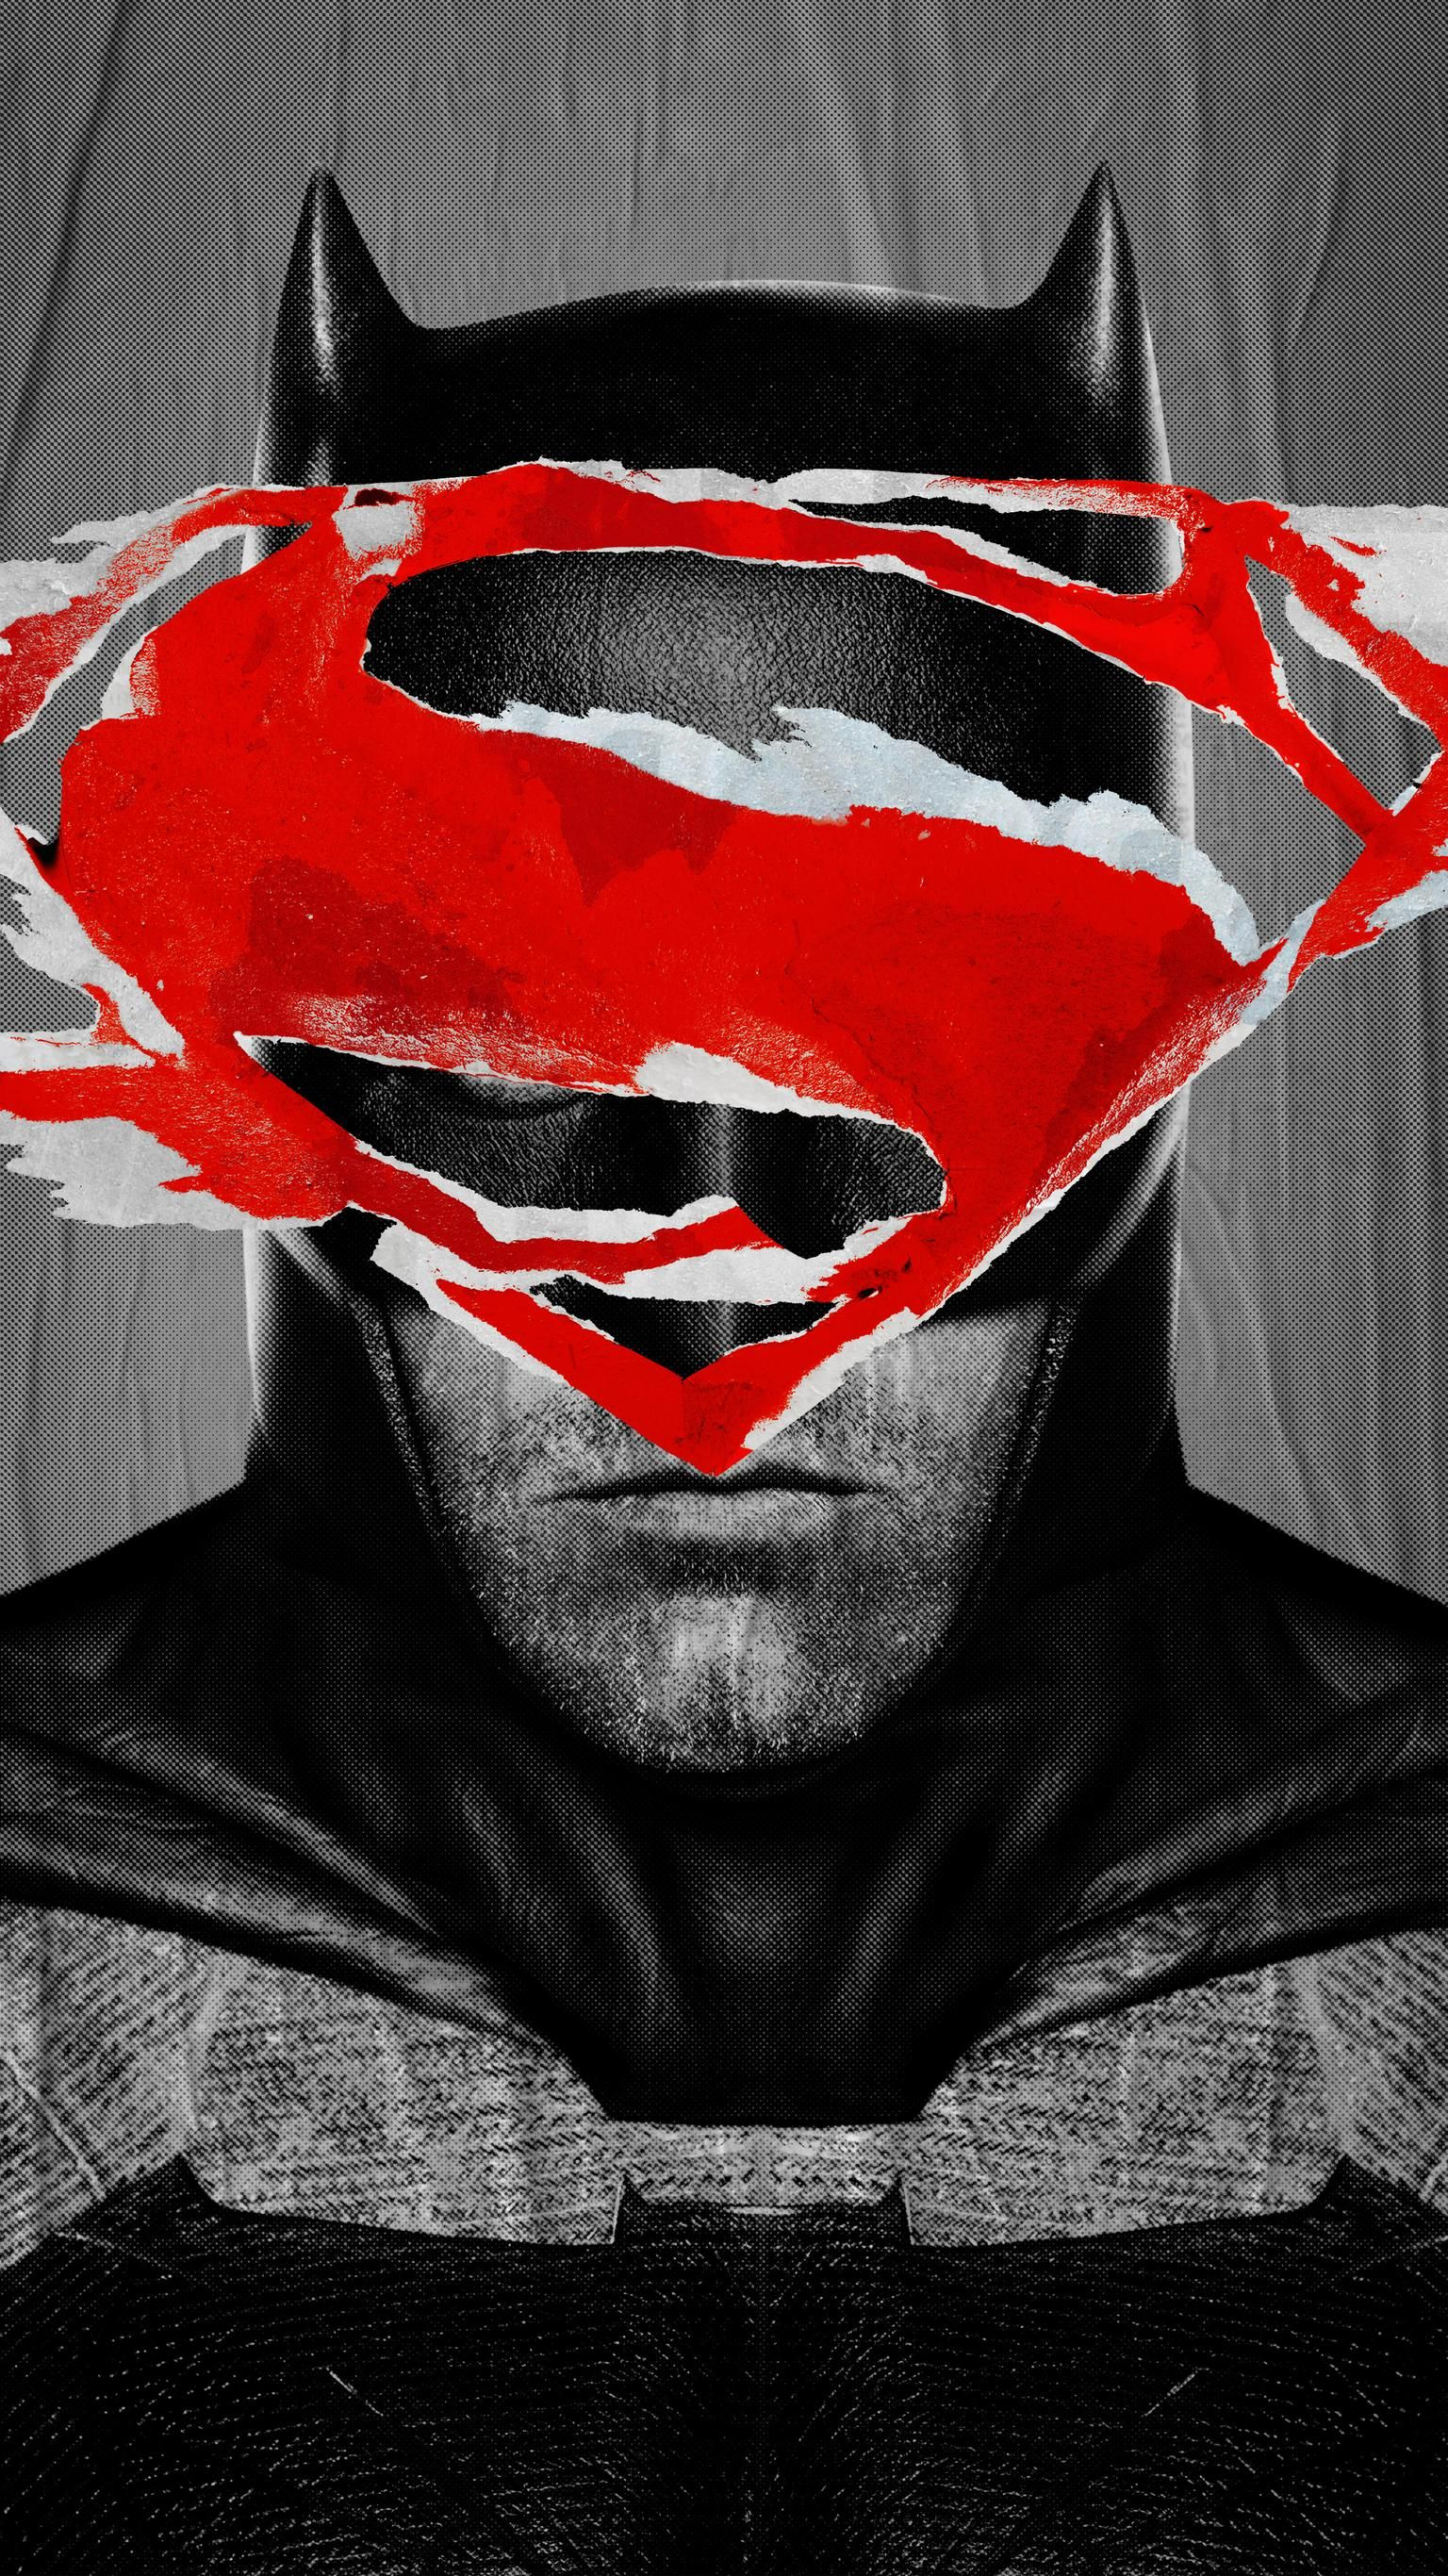 Batman V Superman Dawn Of Justice 2016 Phone Wallpaper Moviemania In 2021 Batman Vs Superman Poster Batman V Superman Poster Batman Vs Superman